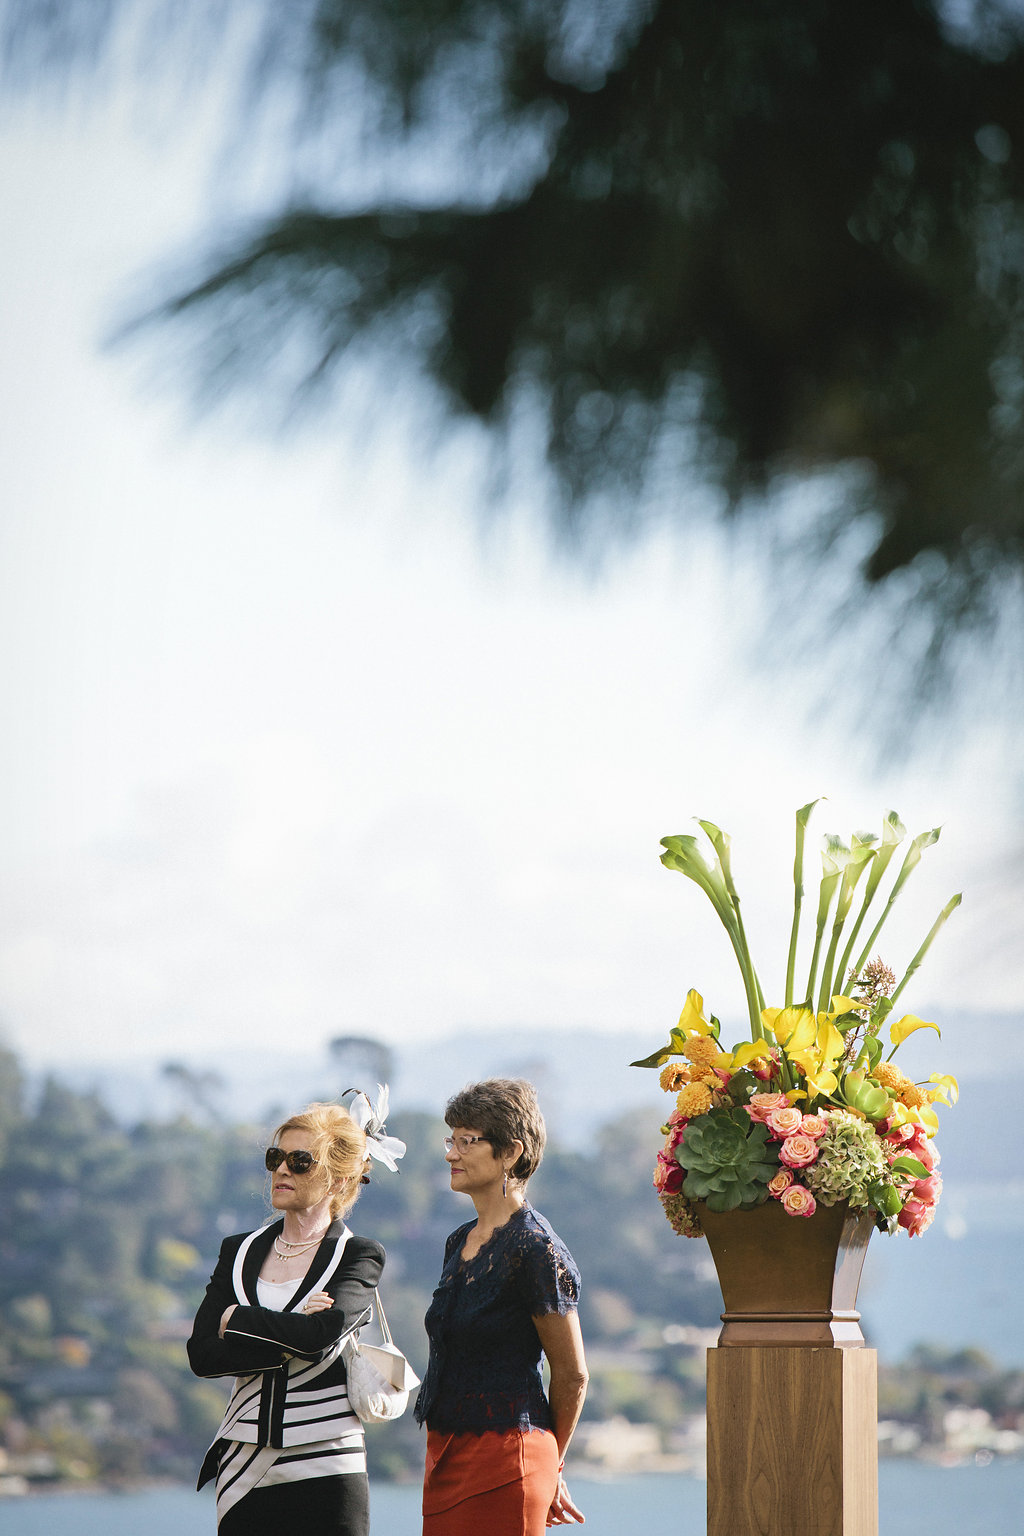 Wedding of Katie Jensen and Matthew Clarke at Community Congregation Church and Guayamas in Tiburon, Calif., Saturday, Oct. 17, 2015. Photos by Alison Yin/Alison Yin Photography